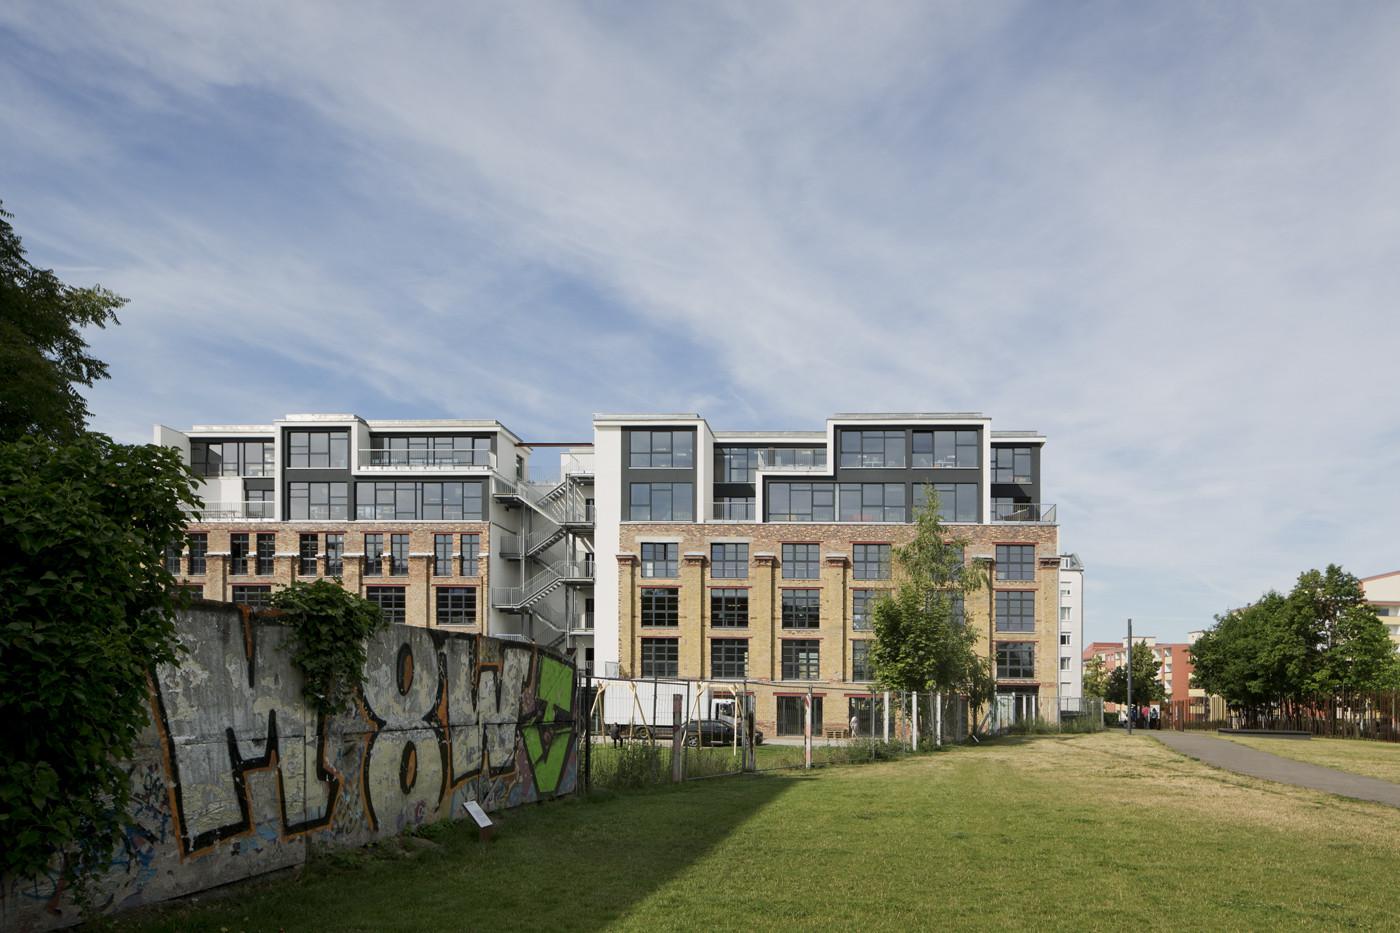 DEU, Berlin, 06/2014, Bürogebaeude Factory, Architekt: Julian Breinersdorfer, Bildtechnik: Digital-KB